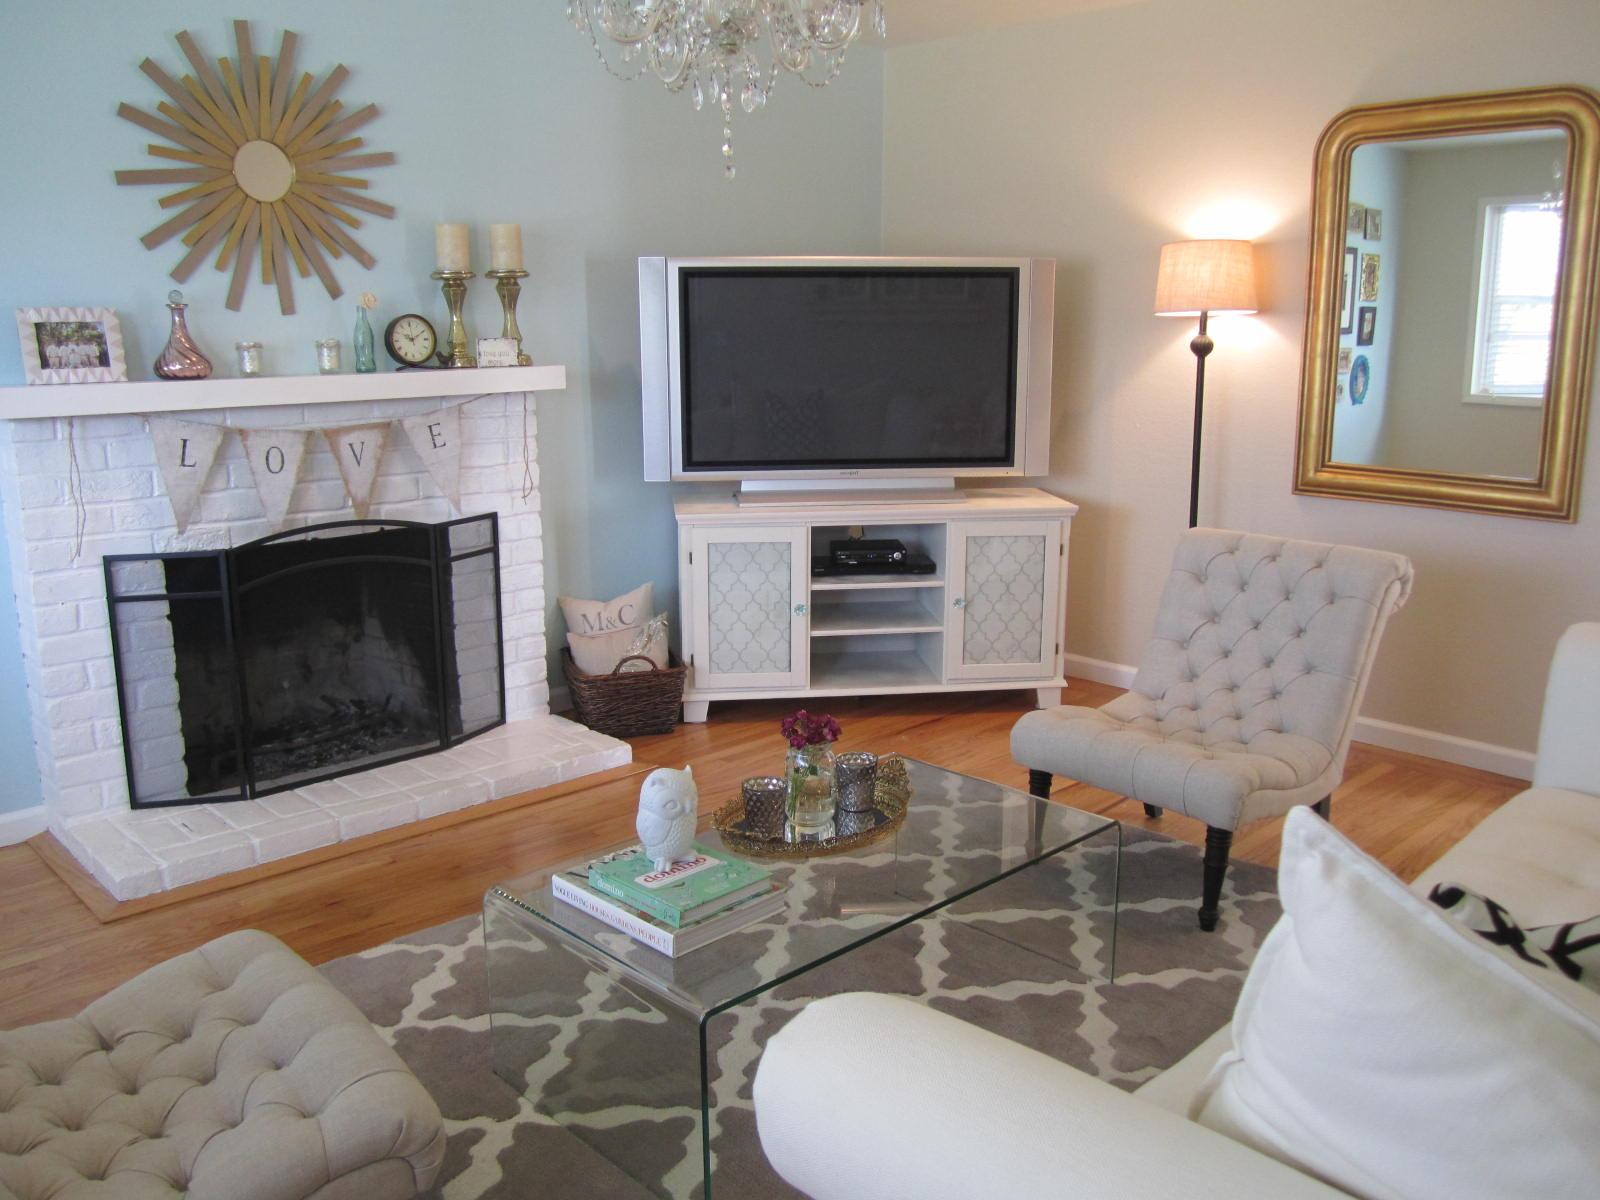 enchanting decorative planrhnickbarronco contemporary asp mirrors fireplace coperhsofacopecom sofa over large mirror above design home mantels for